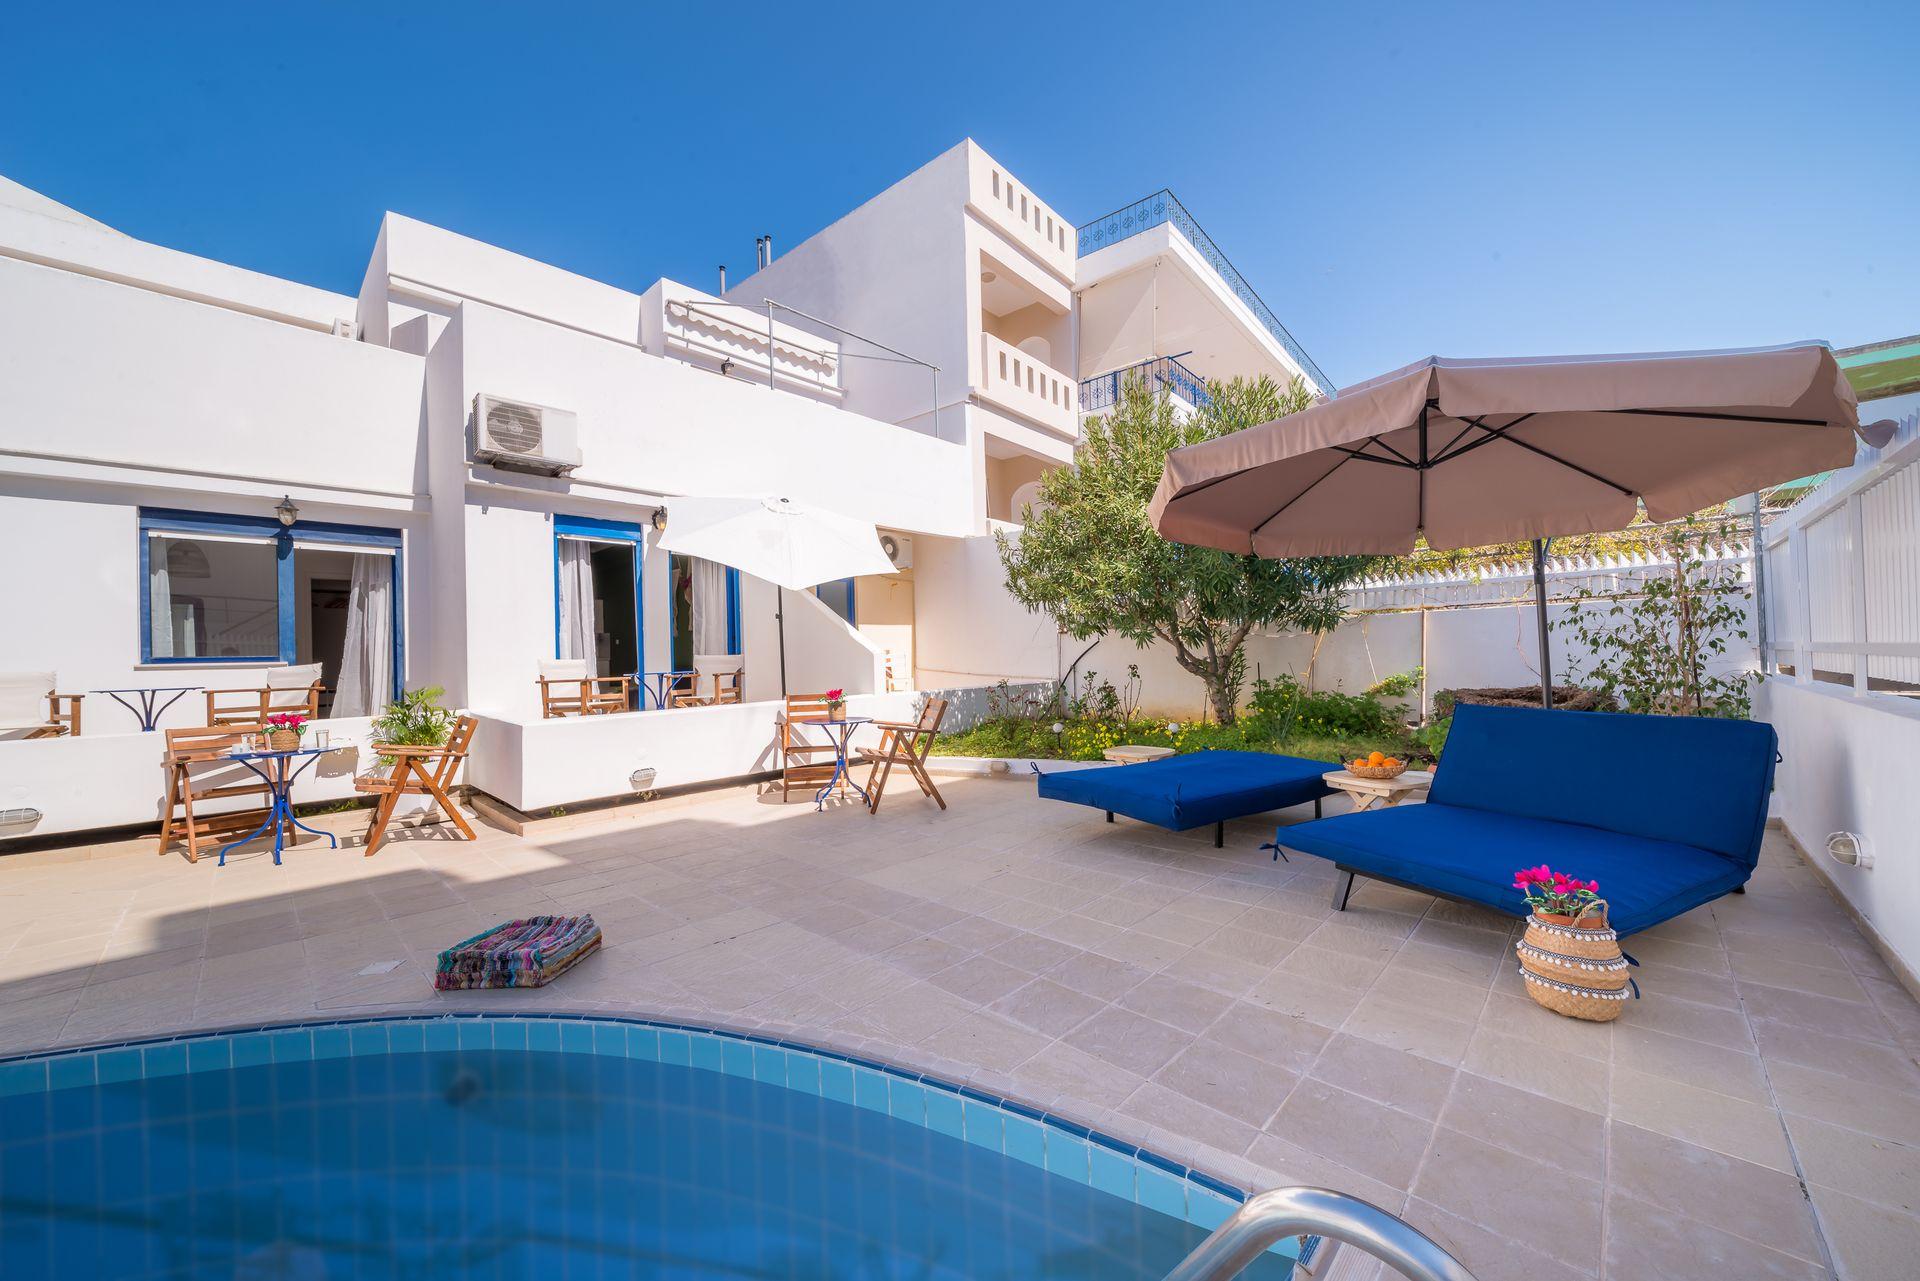 G & K Hotel Fiore di Candia - Ναύπλιο ✦ 4 Ημέρες (3 Διανυκτερεύσεις) ✦ 2 άτομα ✦ Χωρίς Πρωινό ✦ 28/08/2020 έως 13/09/2020 ✦ Free WiFi